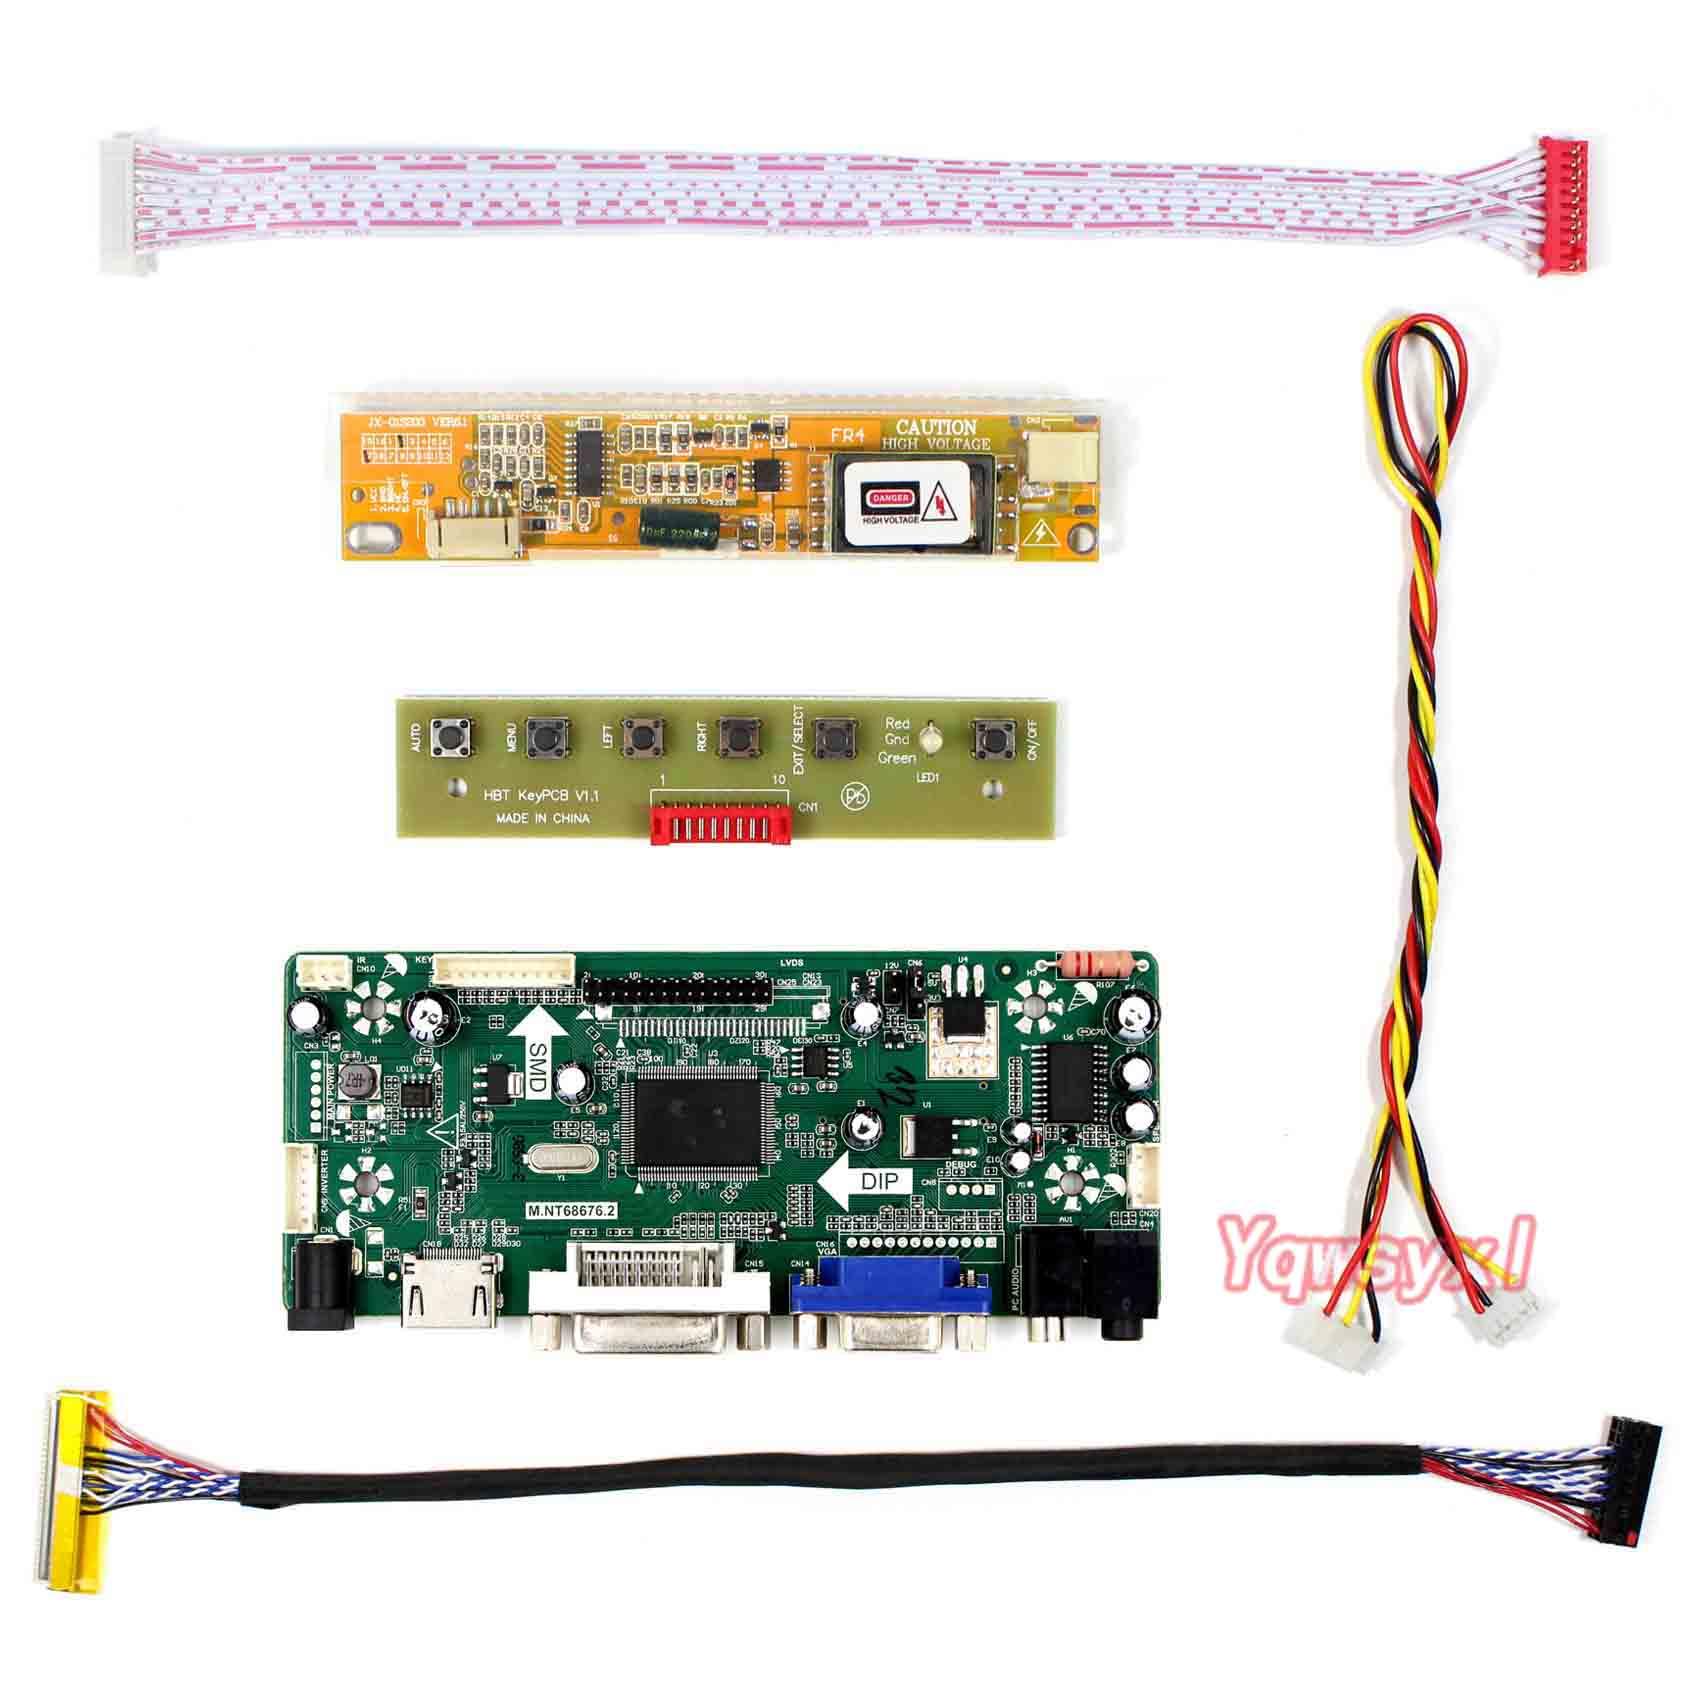 Yqwsyxl Control Board Monitor Kit for N156B3 L02/N156B3 L01 HDMI + DVI + VGA LCD LED screen Controller Board Driver|Tablet LCDs & Panels| |  - title=